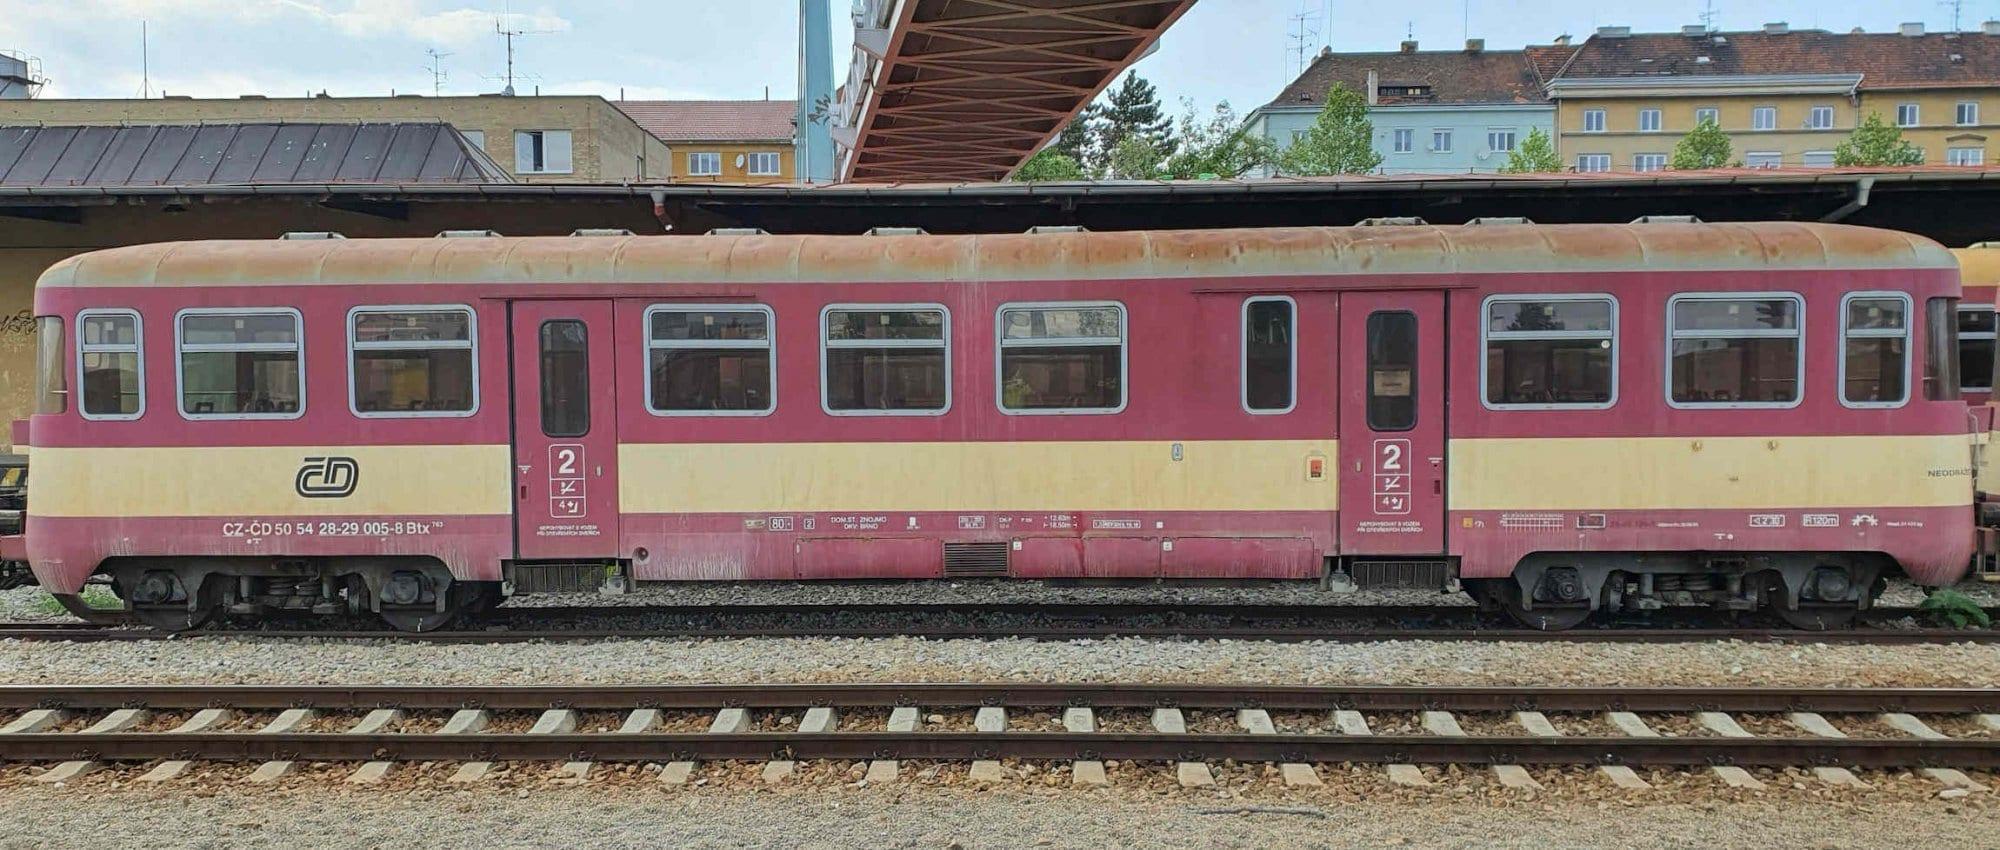 Popis a hodnocení vozu Btx 763